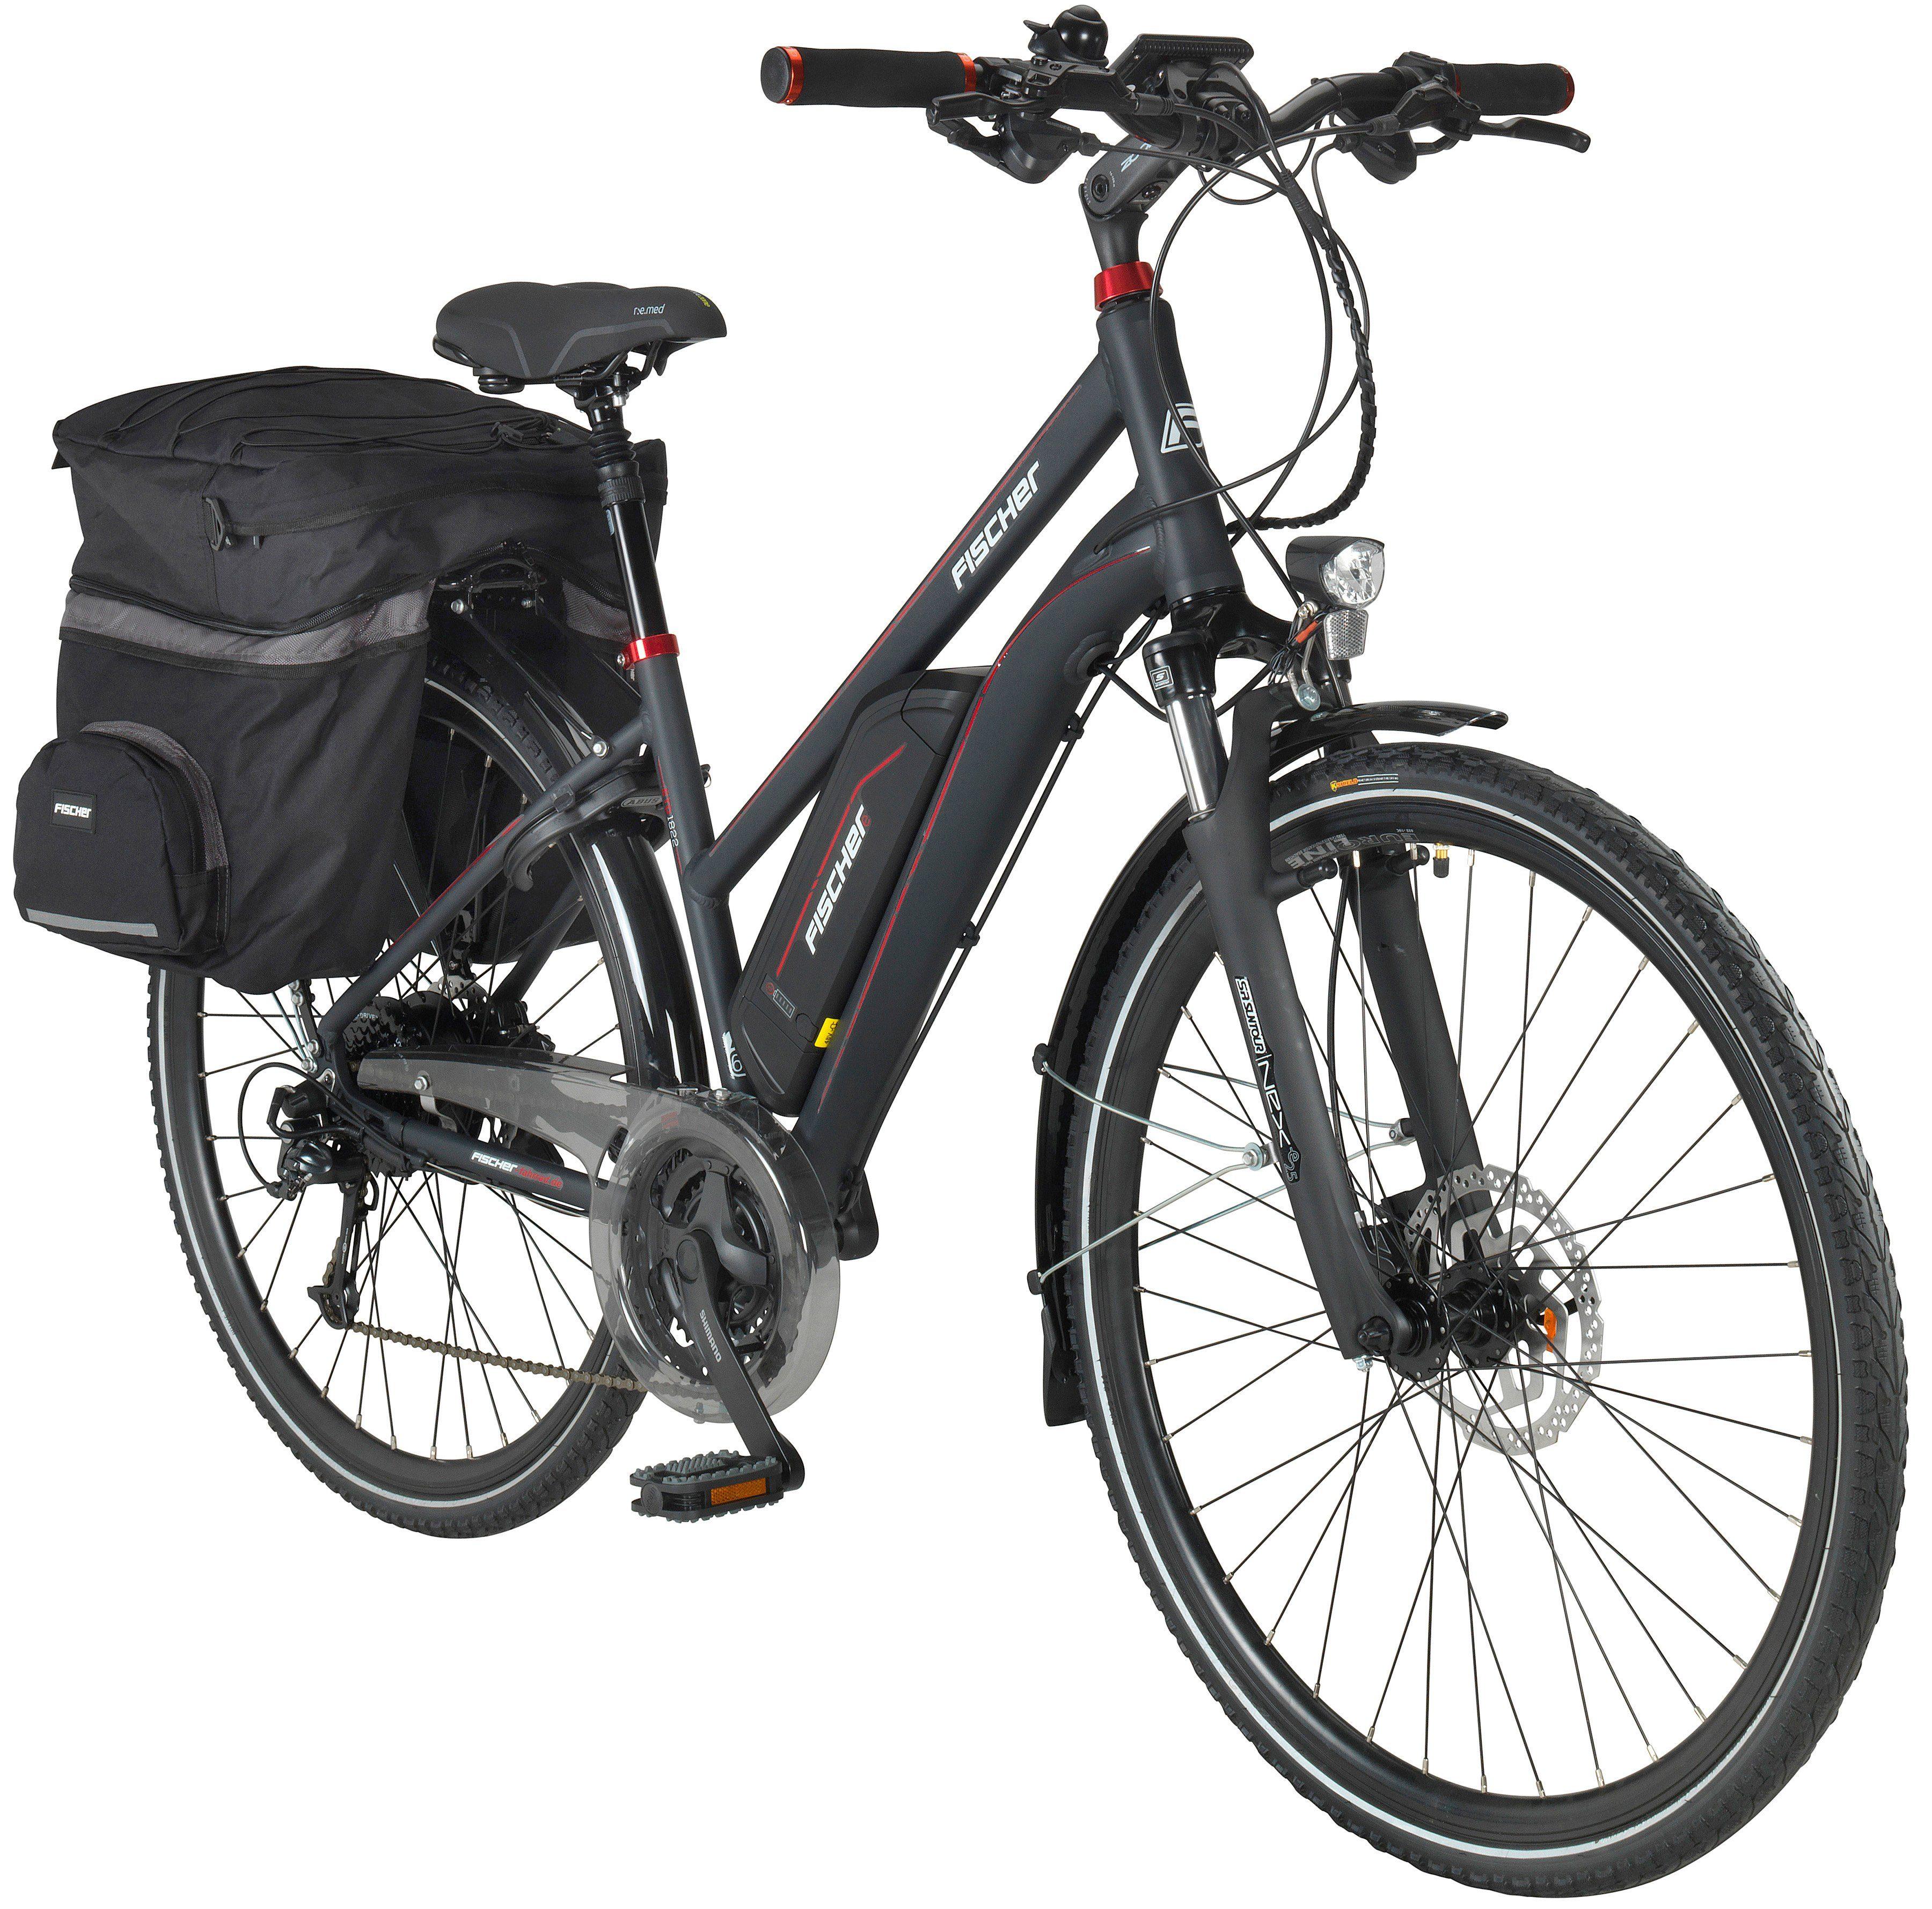 FISCHER FAHRRAEDER E-Bike Trekking Damen »ETD1822«, 71,12 cm (28 Zoll), 24 Gänge, 557 Wh, Heckmotor